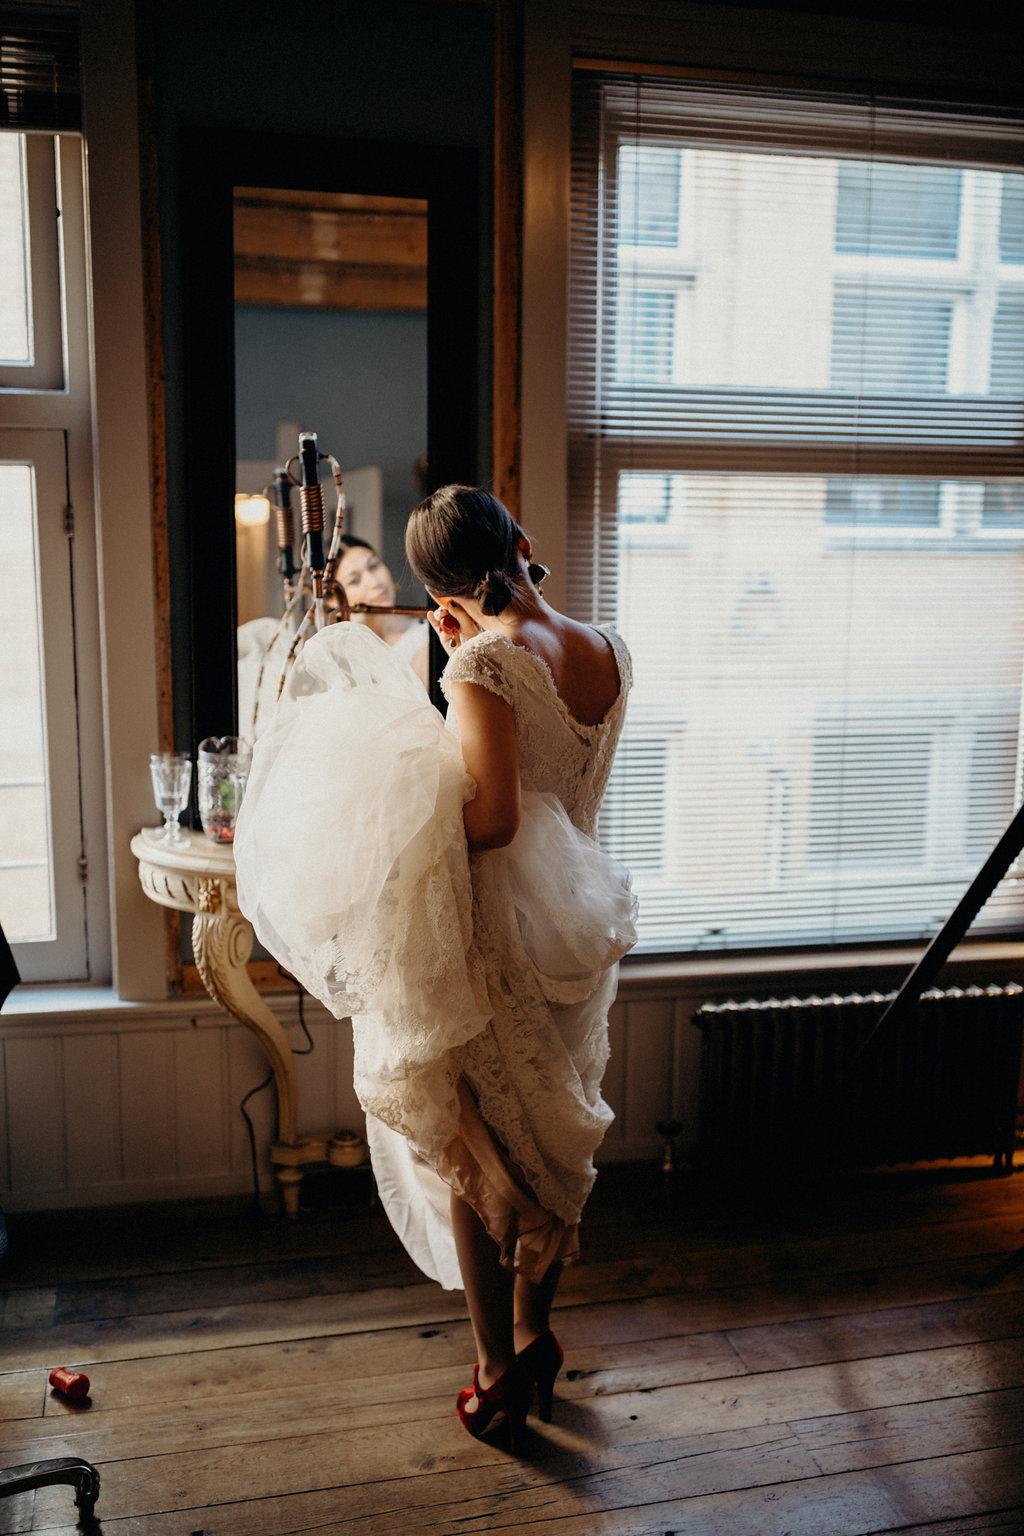 100-sjoerdbooijphotography-wedding-coen-janaina.jpg